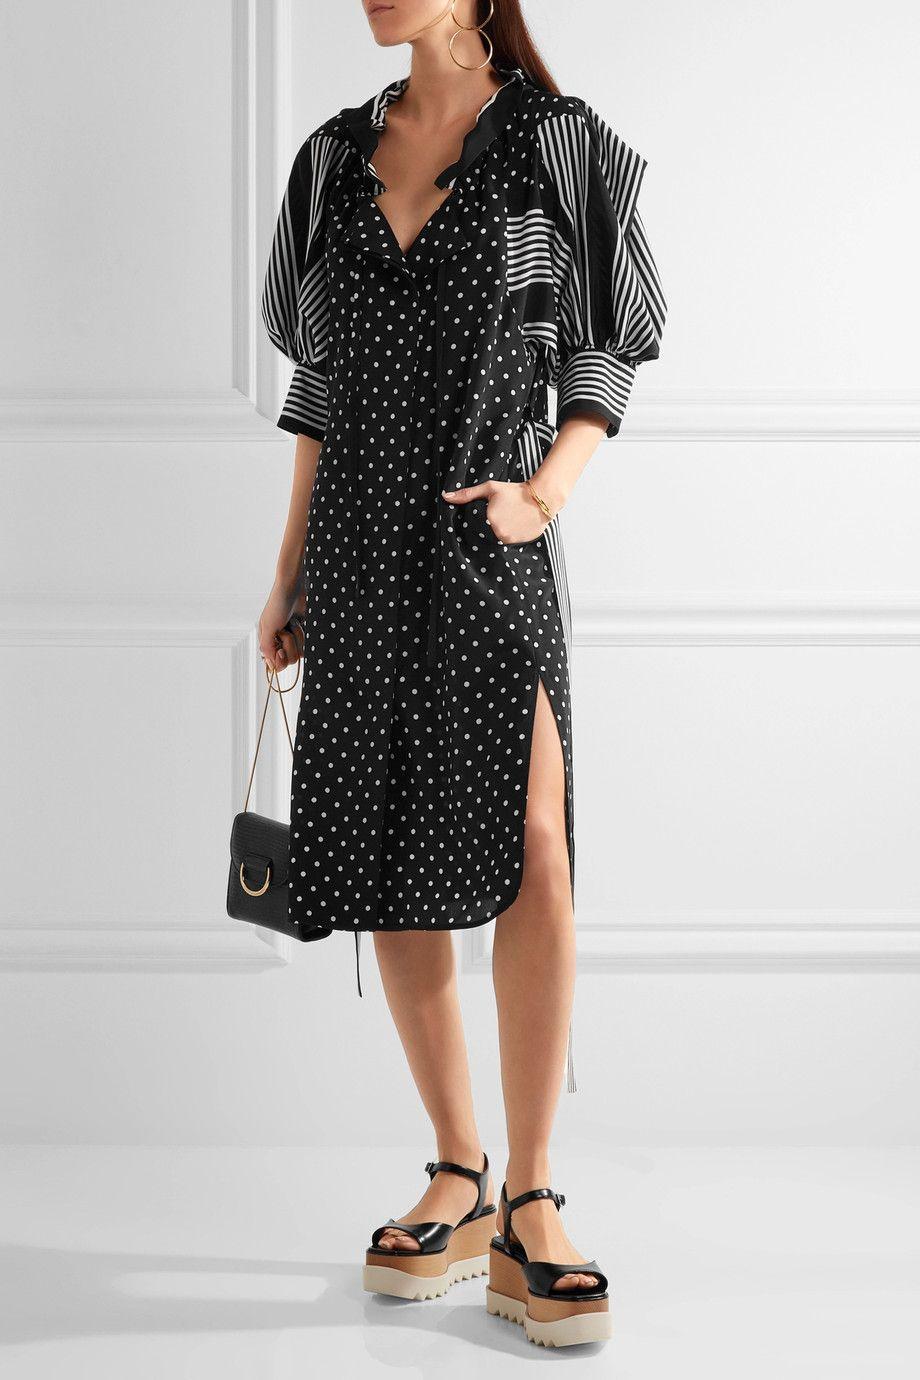 Stella Mccartney Woman Valeria Ruffled Printed Silk Dress Black Size 38 Stella McCartney Sale Amazon KLKNI